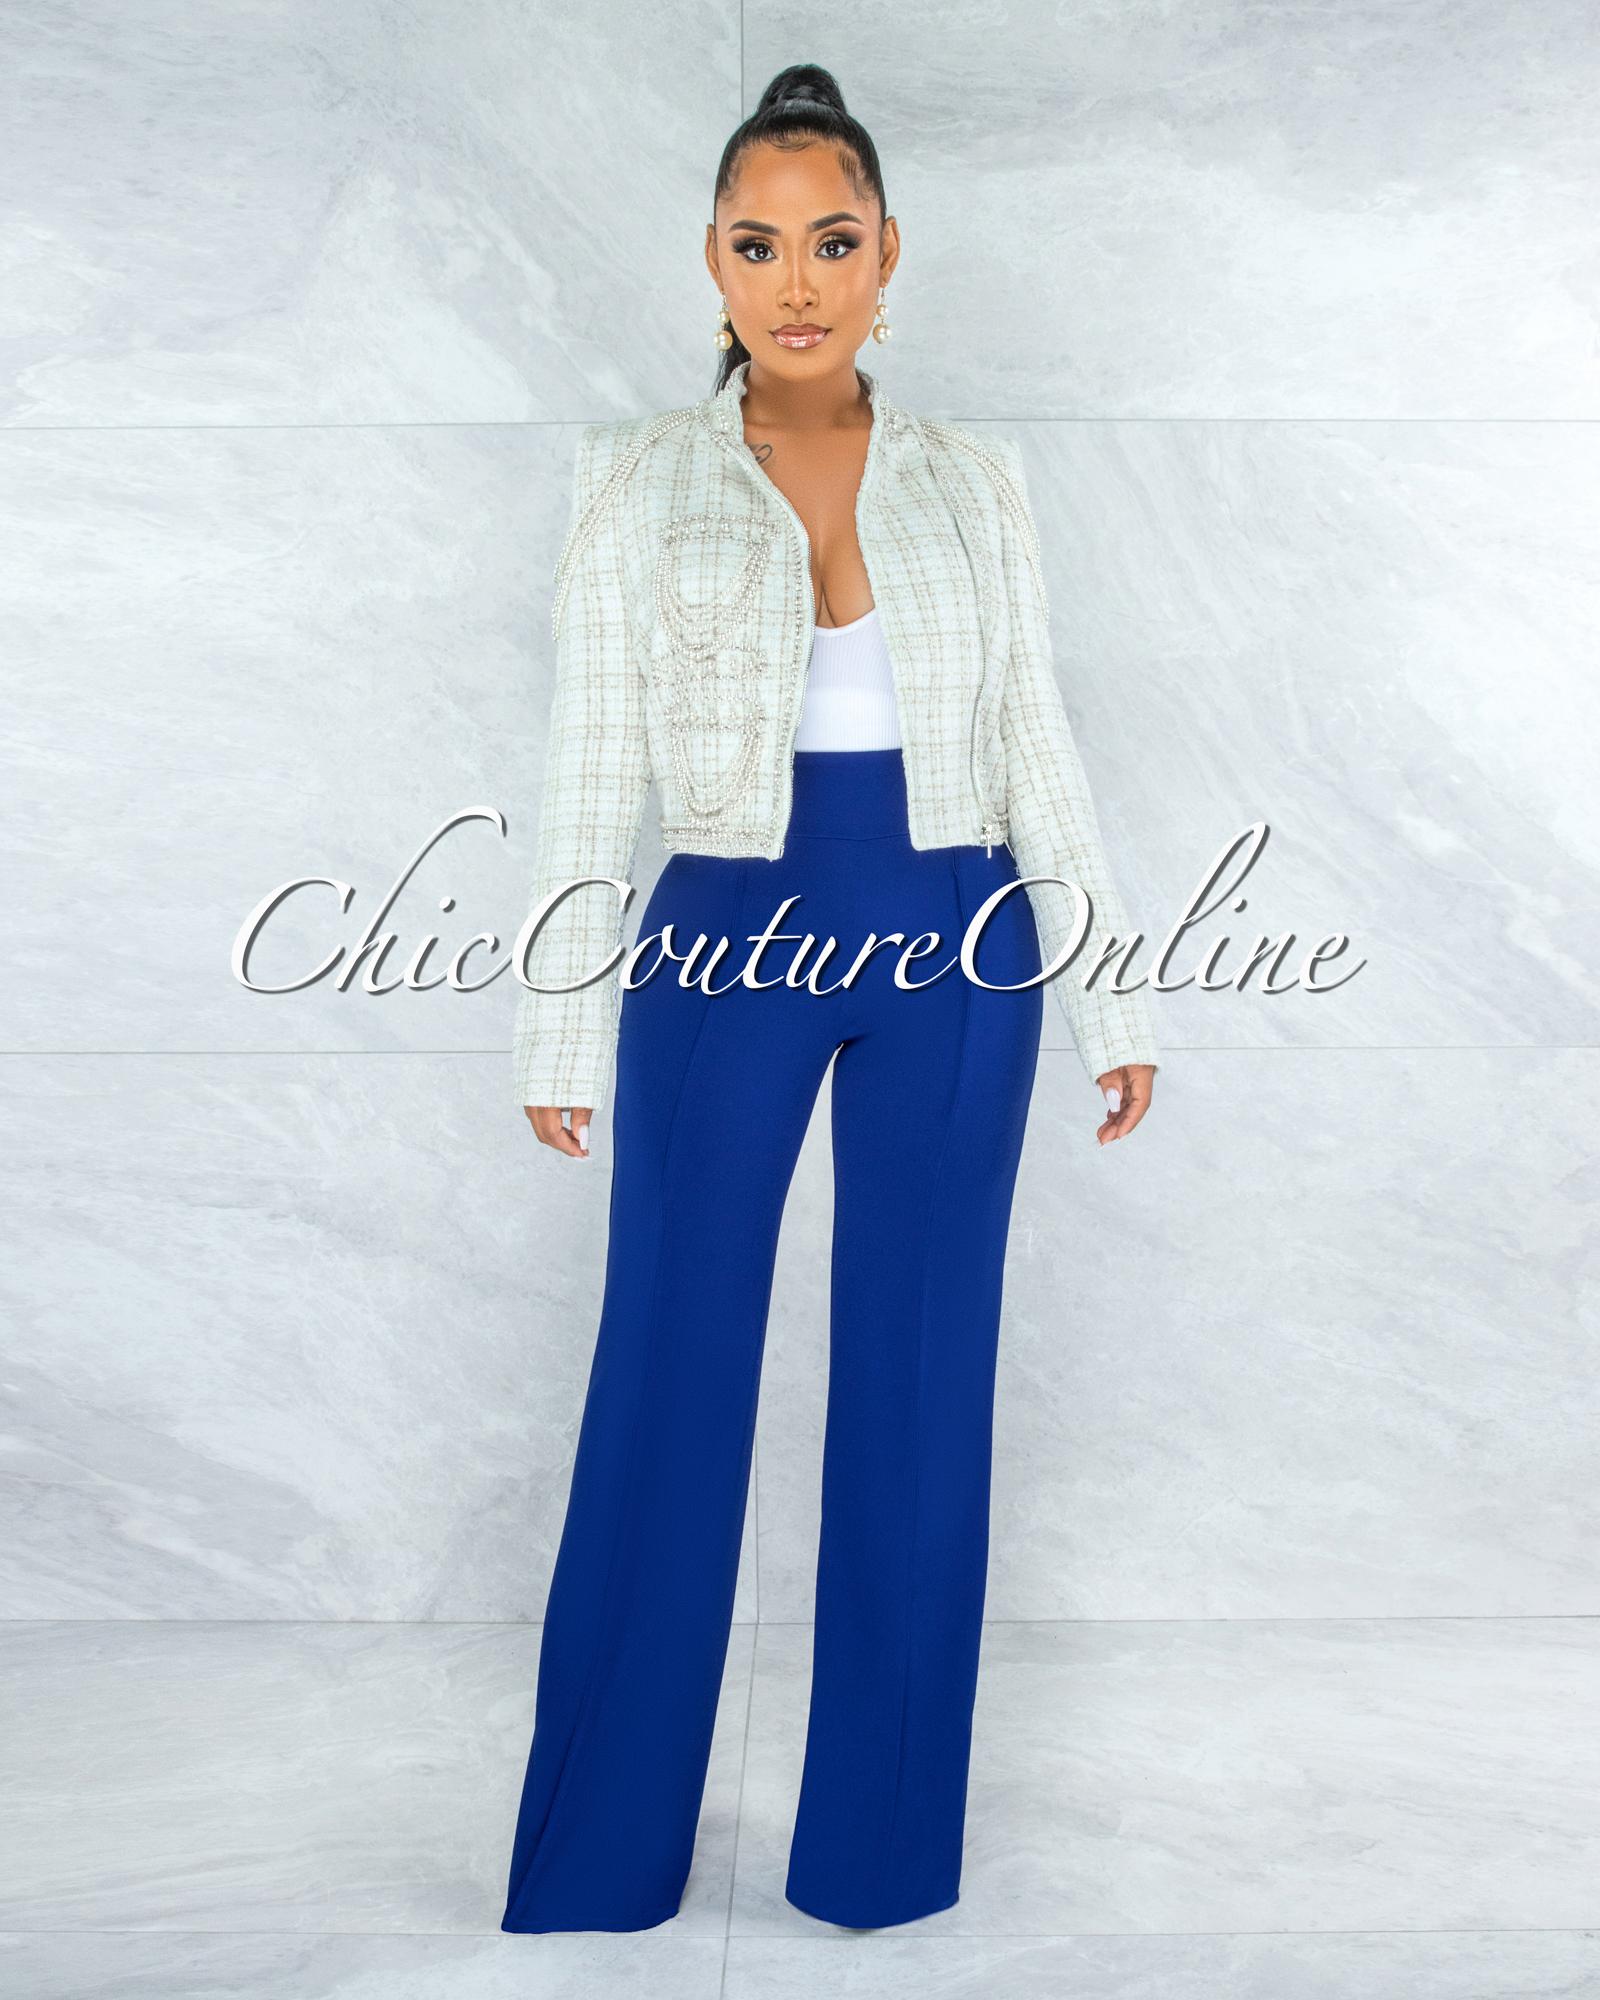 Zabel Cream Pearl Rhinestones Décor Tweed Luxe Jacket